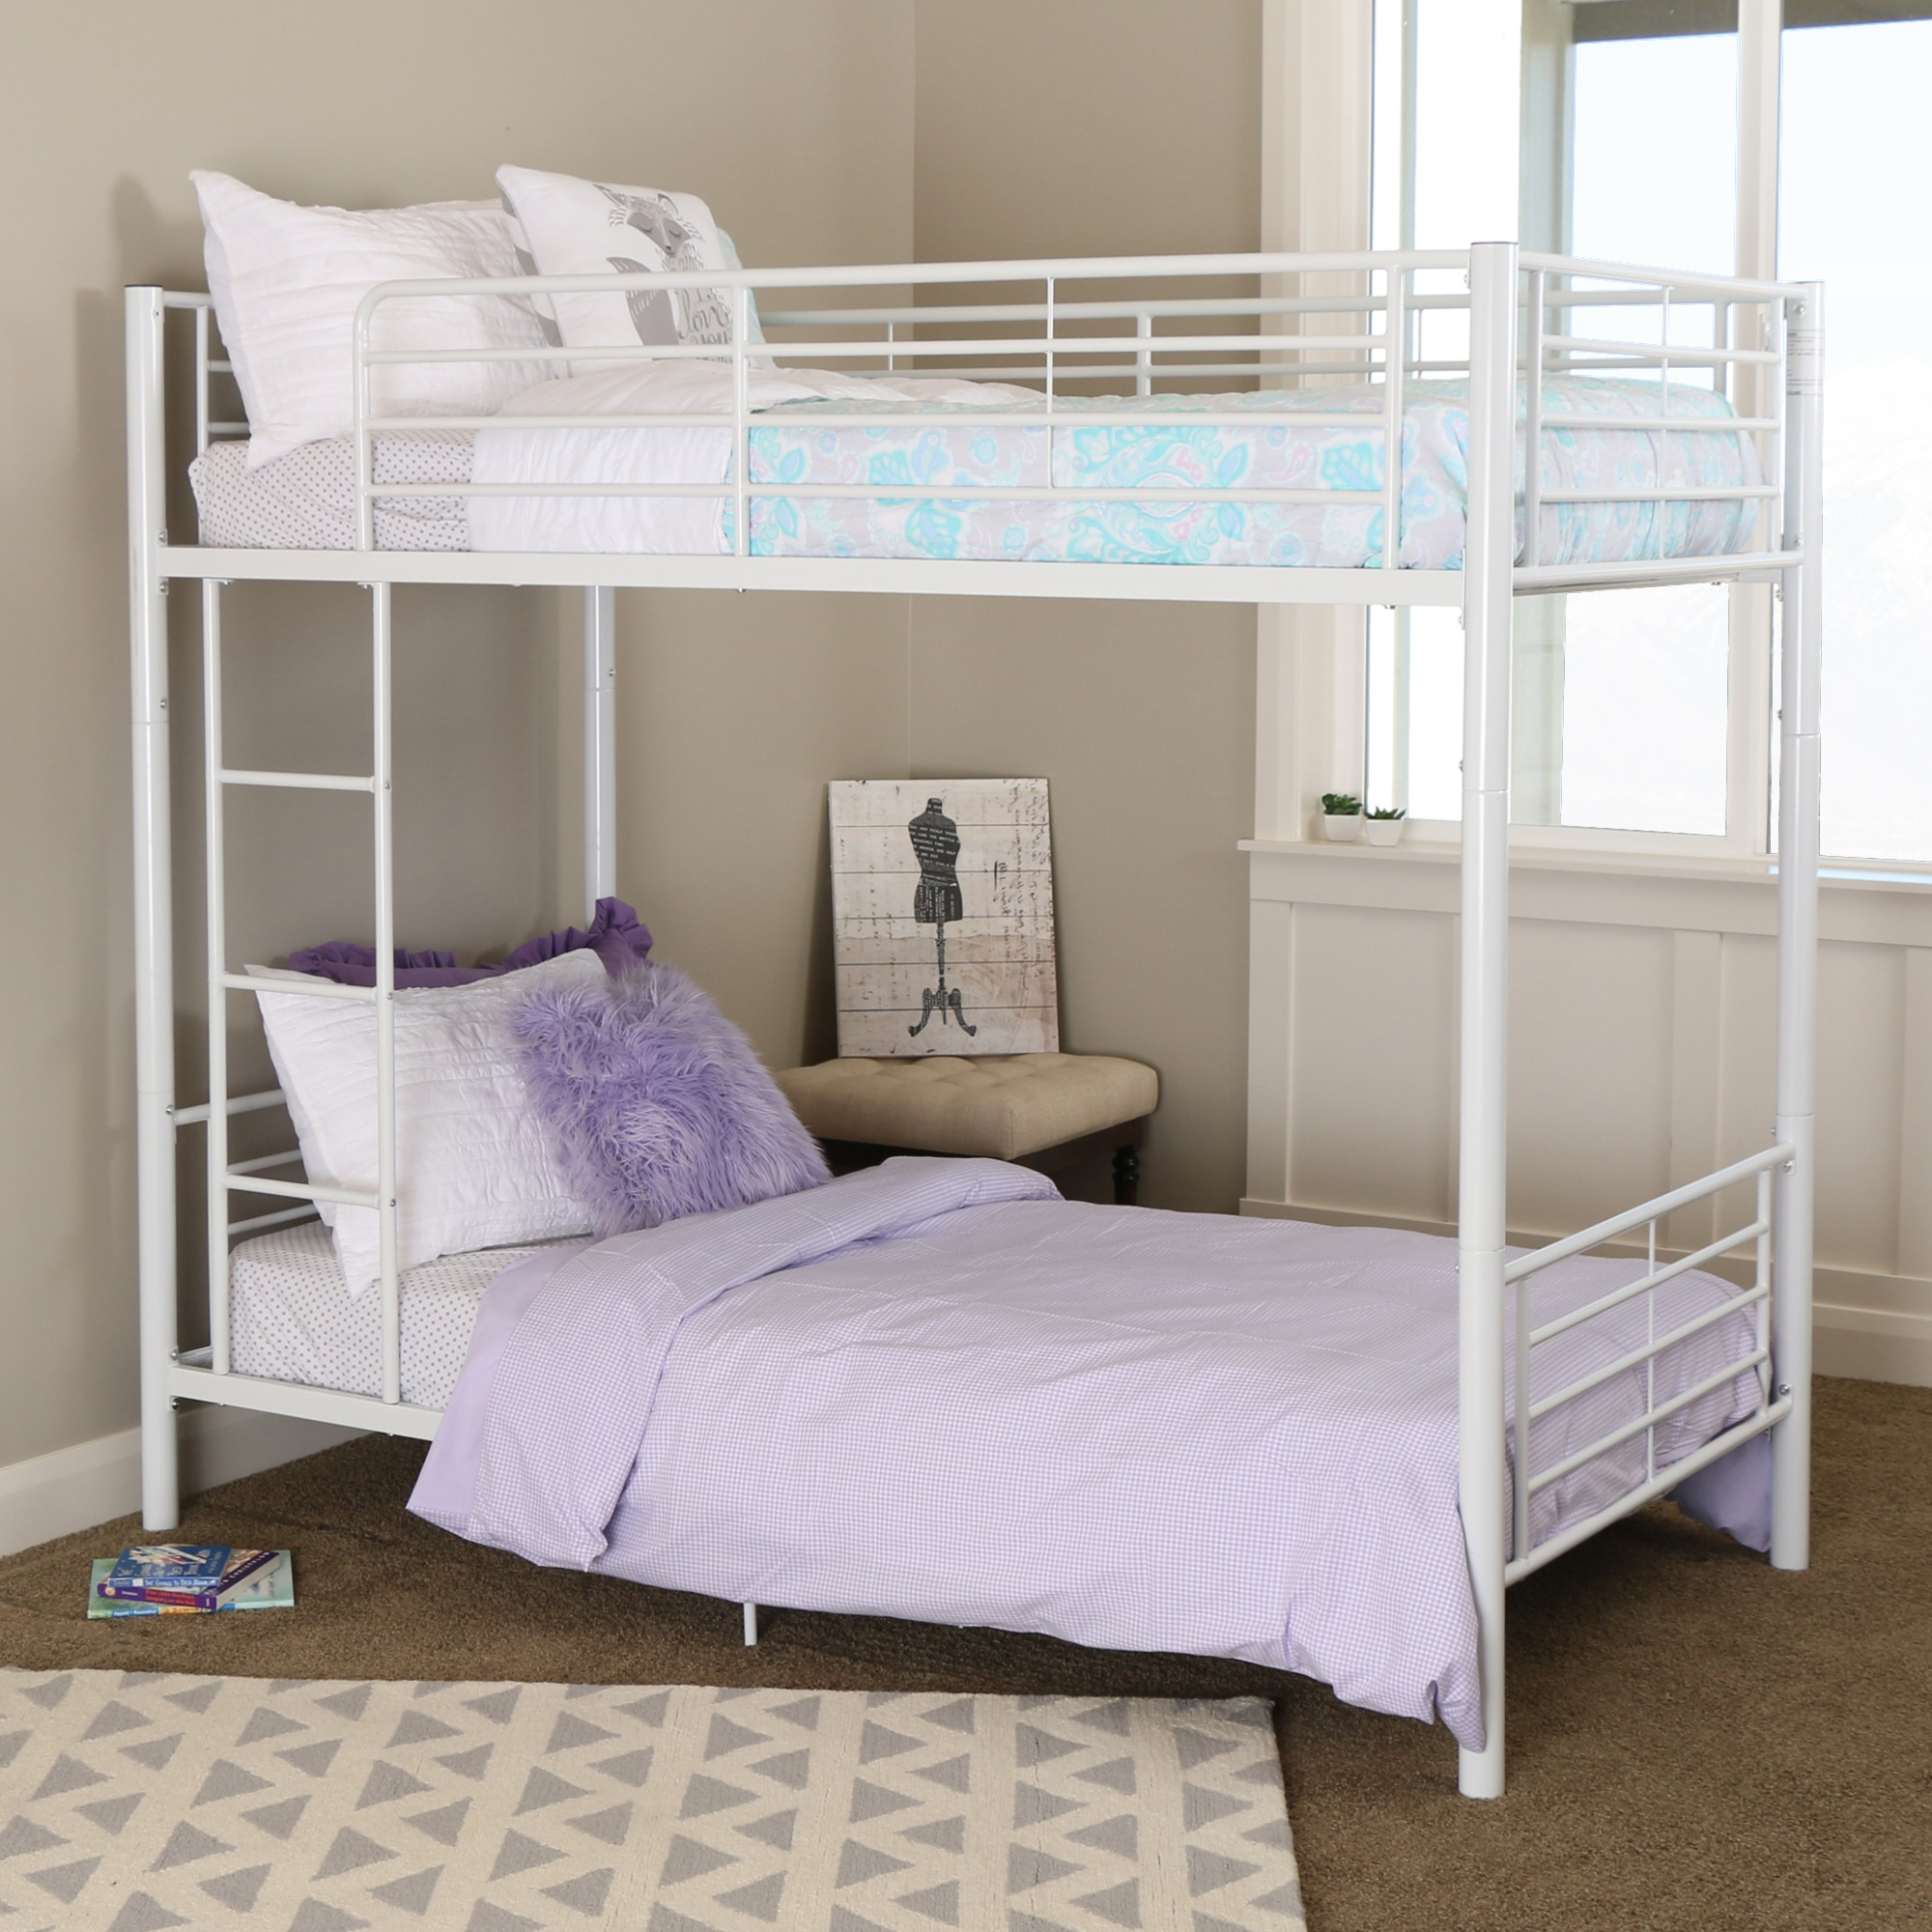 Fullsize Of Metal Bunk Beds